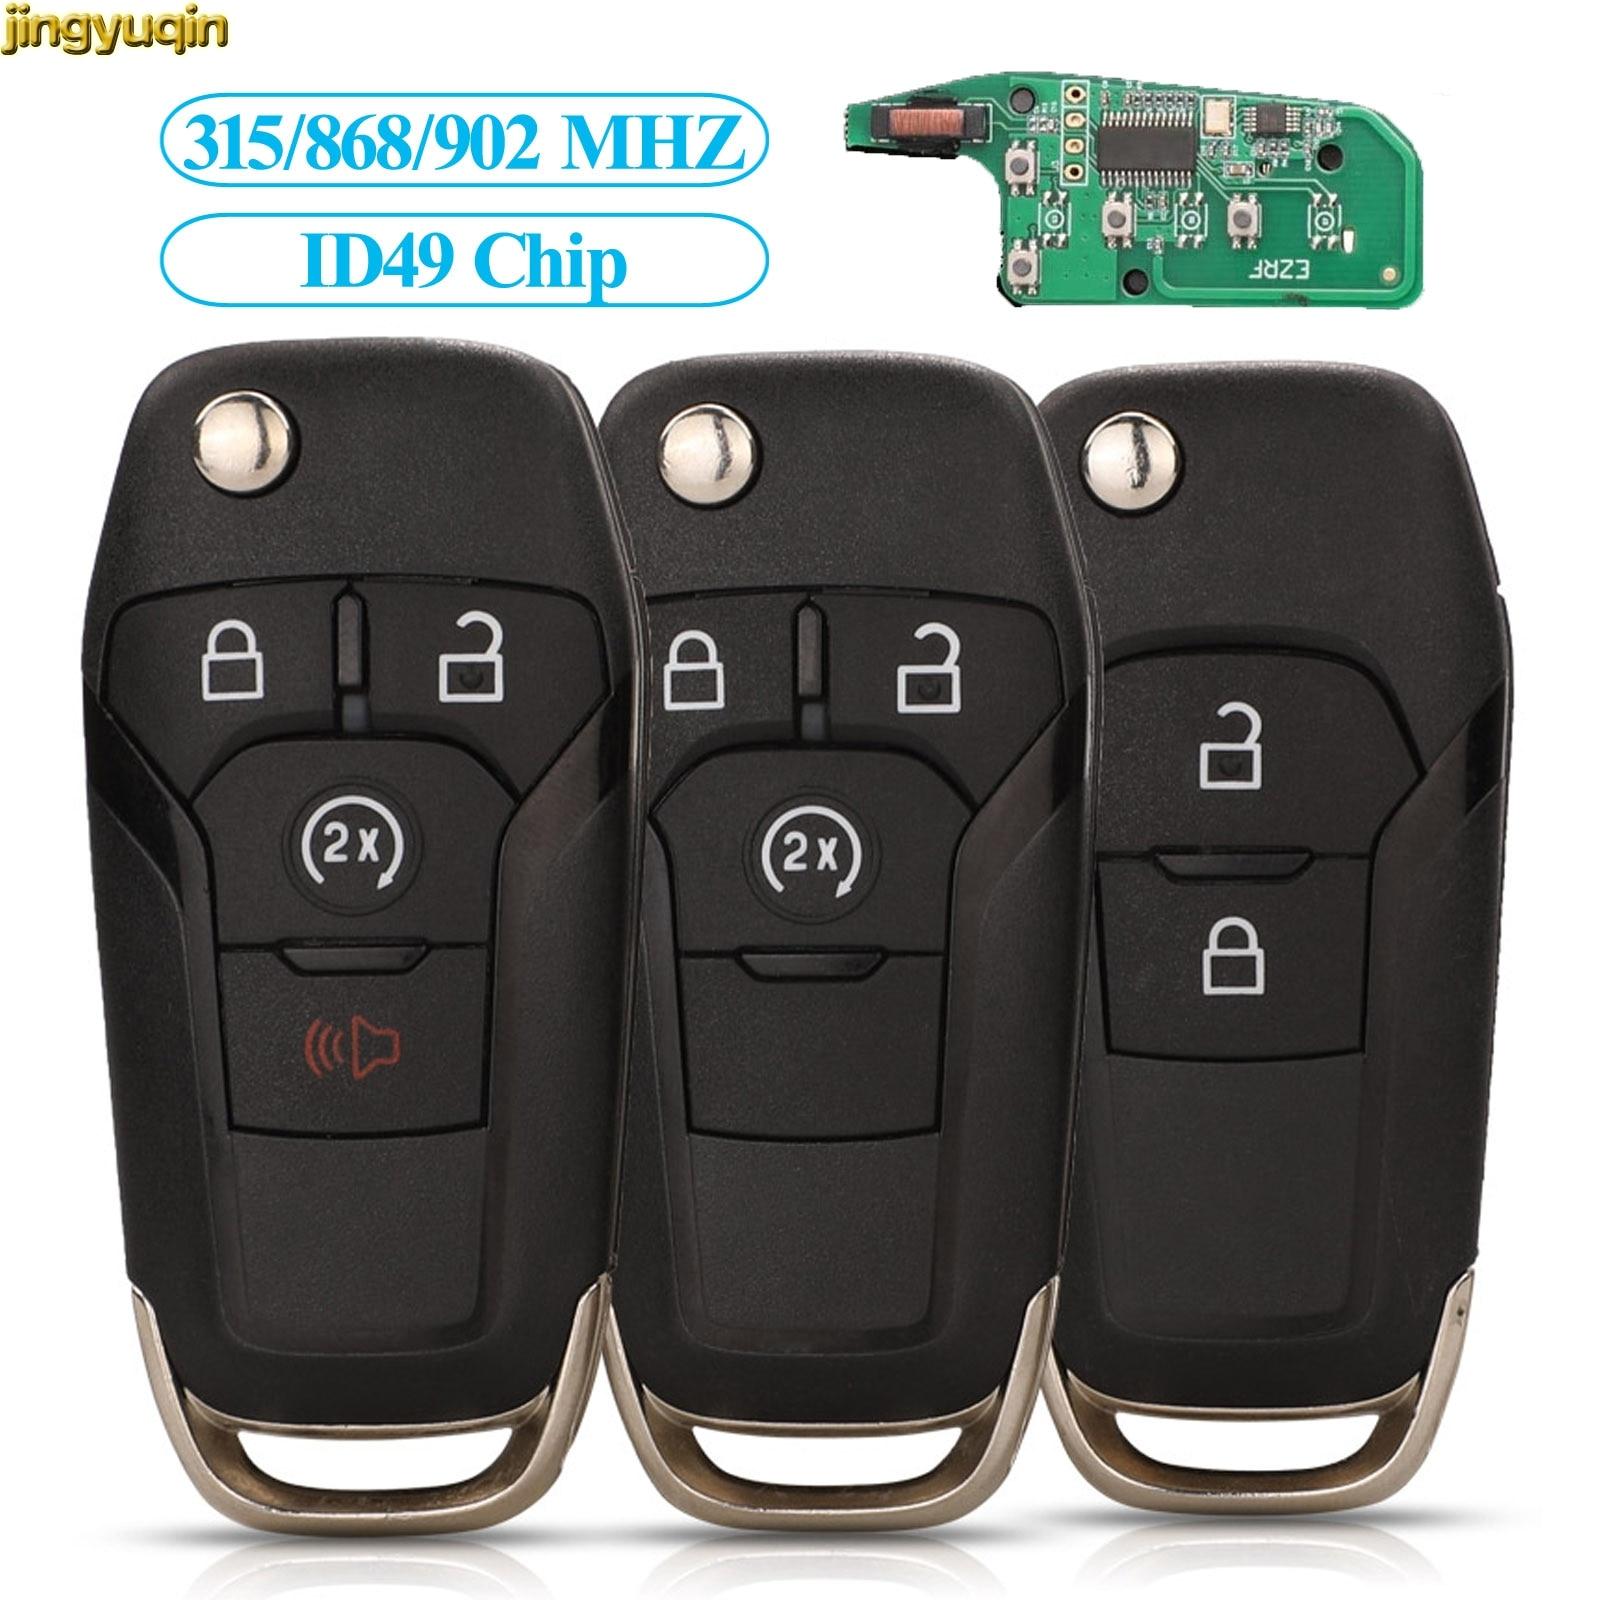 Jingyuqin Remote Car Key Control 315/868/902 Mhz ID49 Chip For Ford Fusion 2013-2015 HU101 2/3/4 Button Folding Keyless Entry